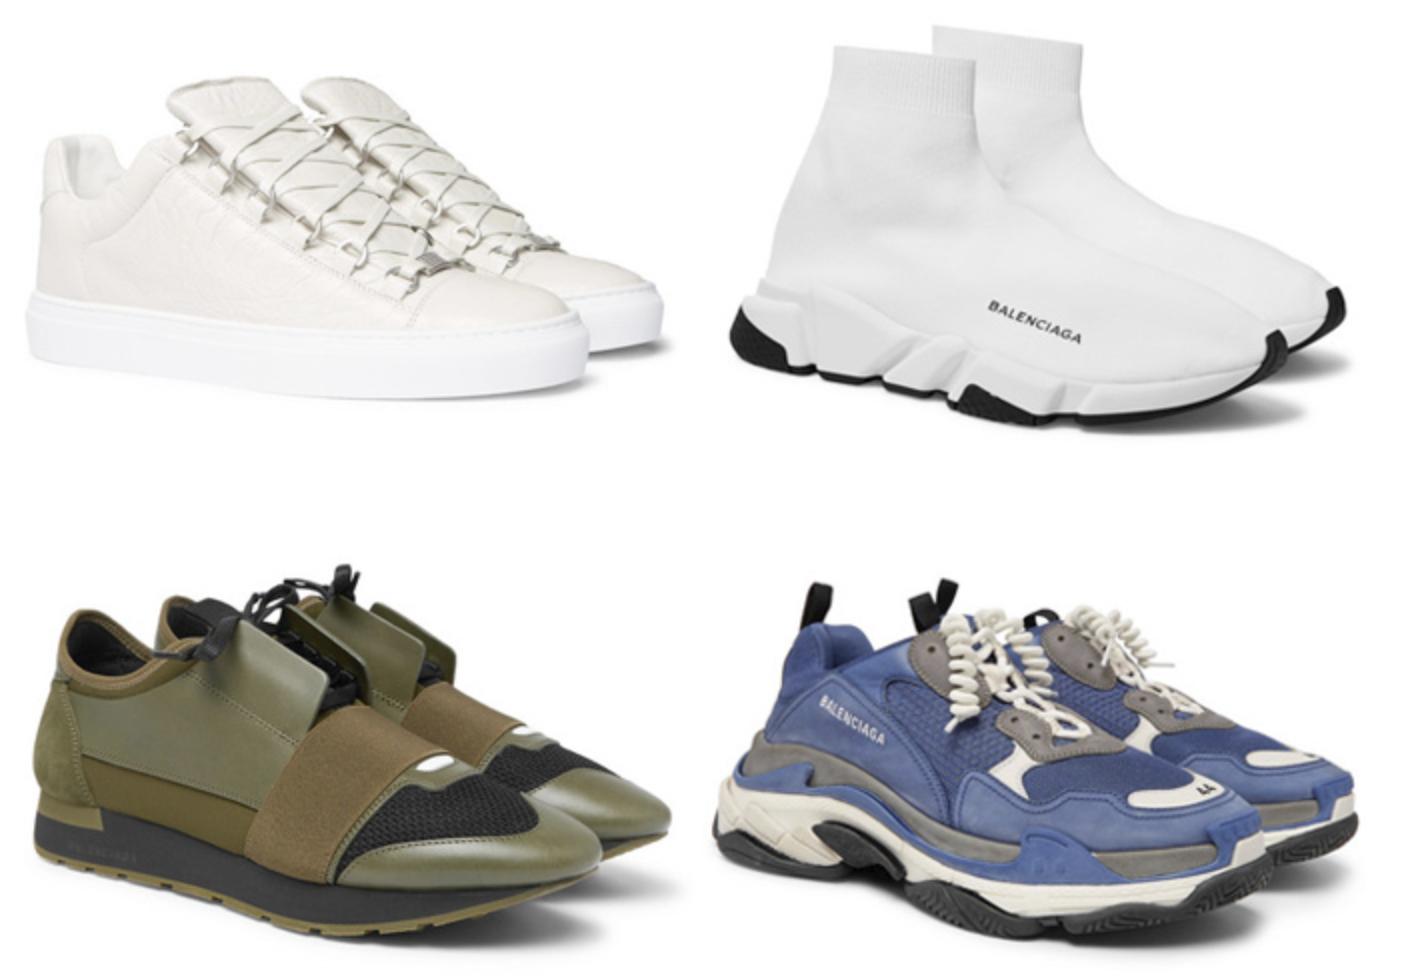 Sepatu Luxury Sneakers Balenciaga Terbaik luxury sneakers - 14 Luxury Sneakers Terbaik dari Desainer Dunia